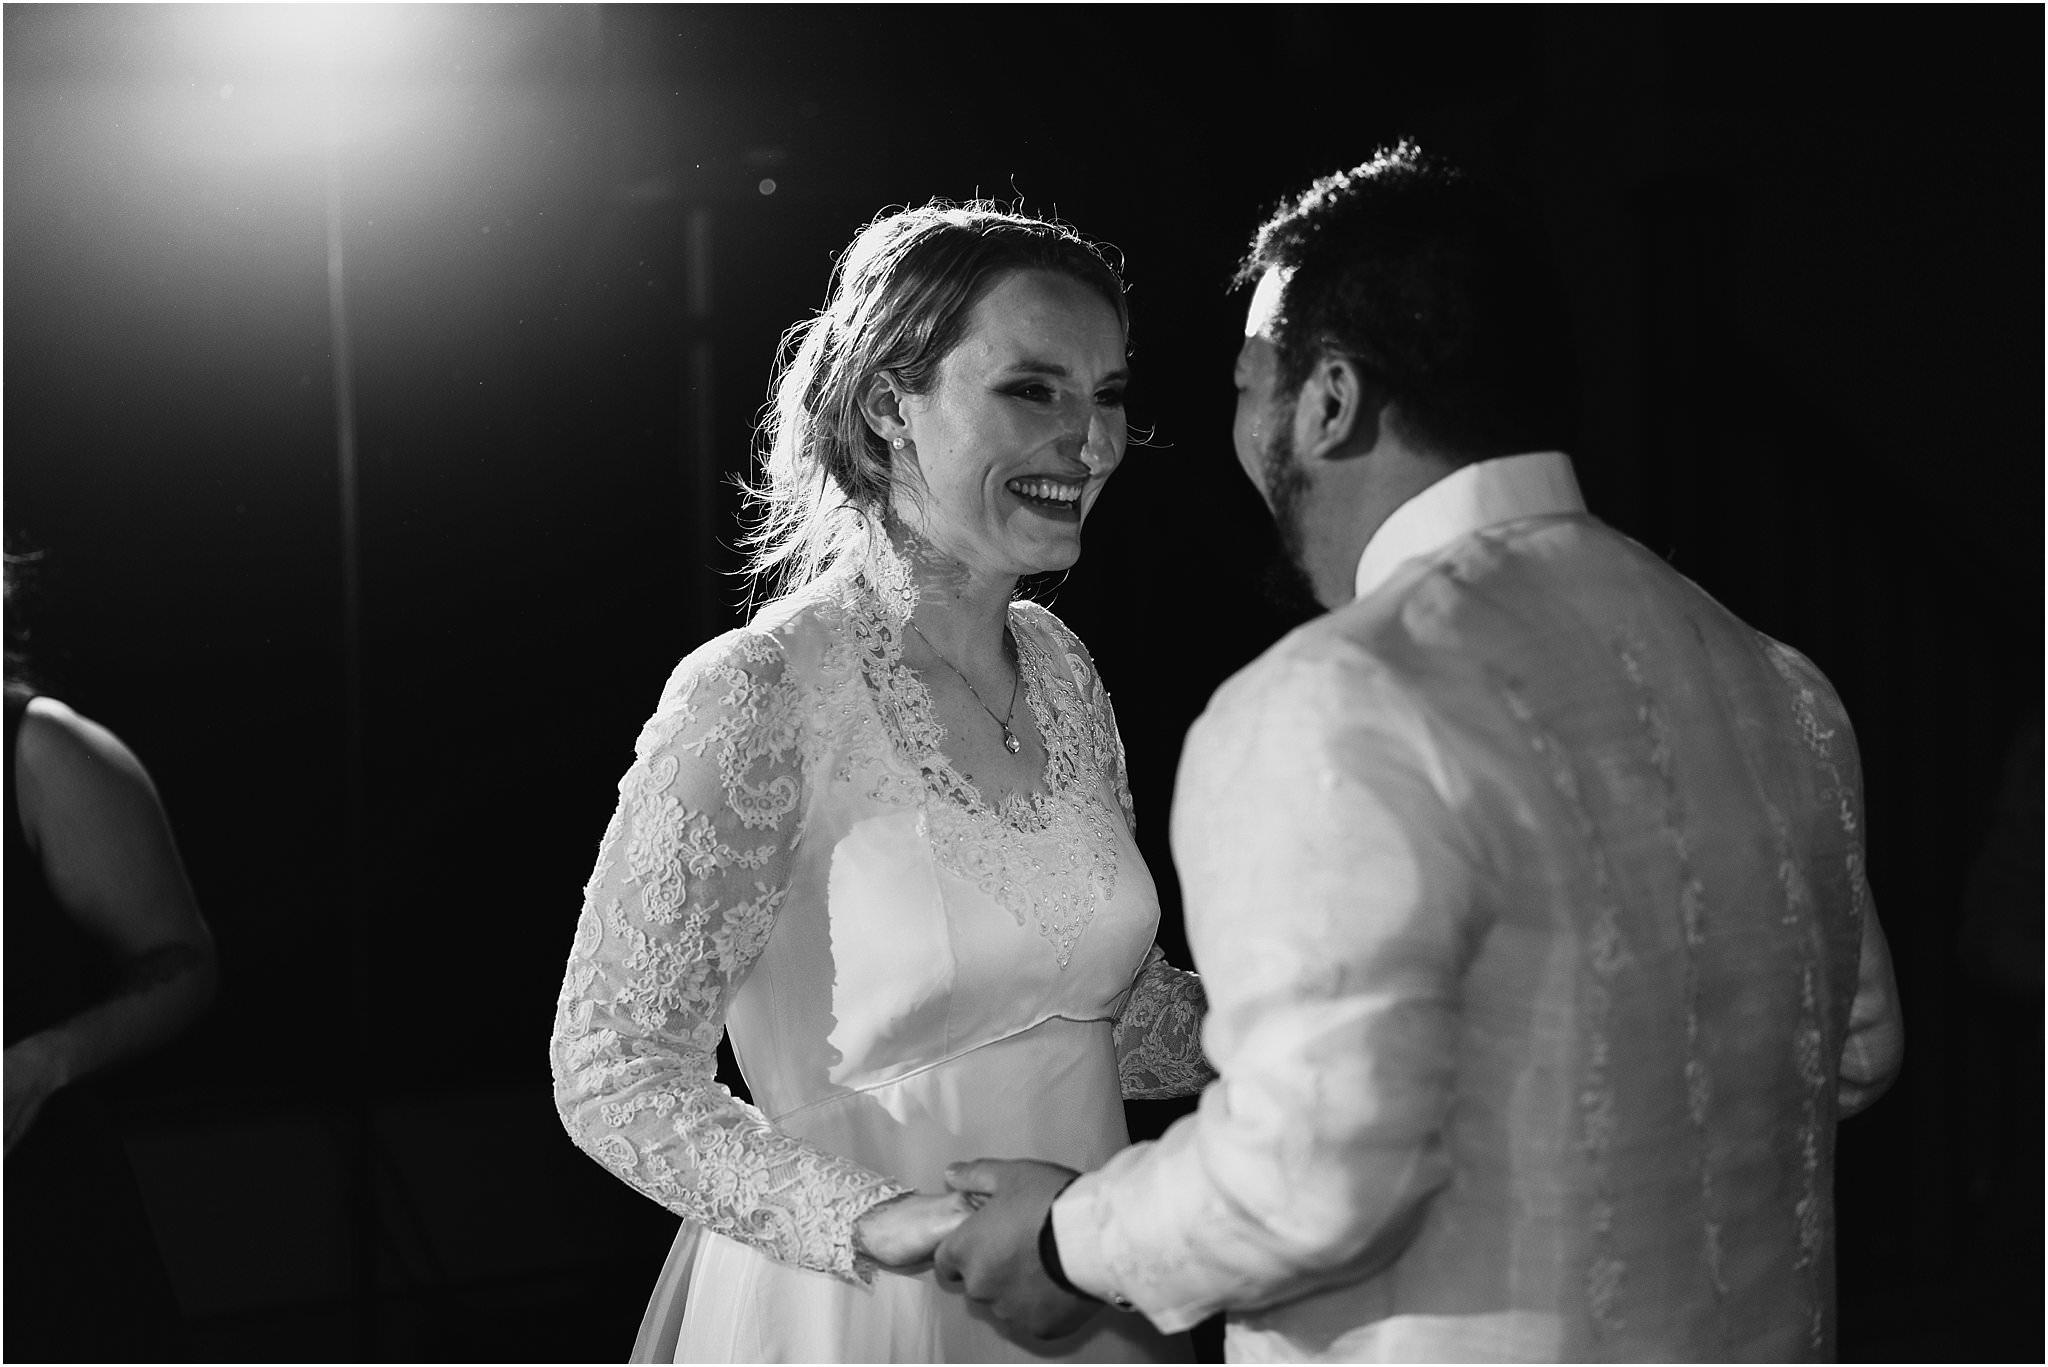 katy-robin-married-in-mukilteo-wedding51.jpg